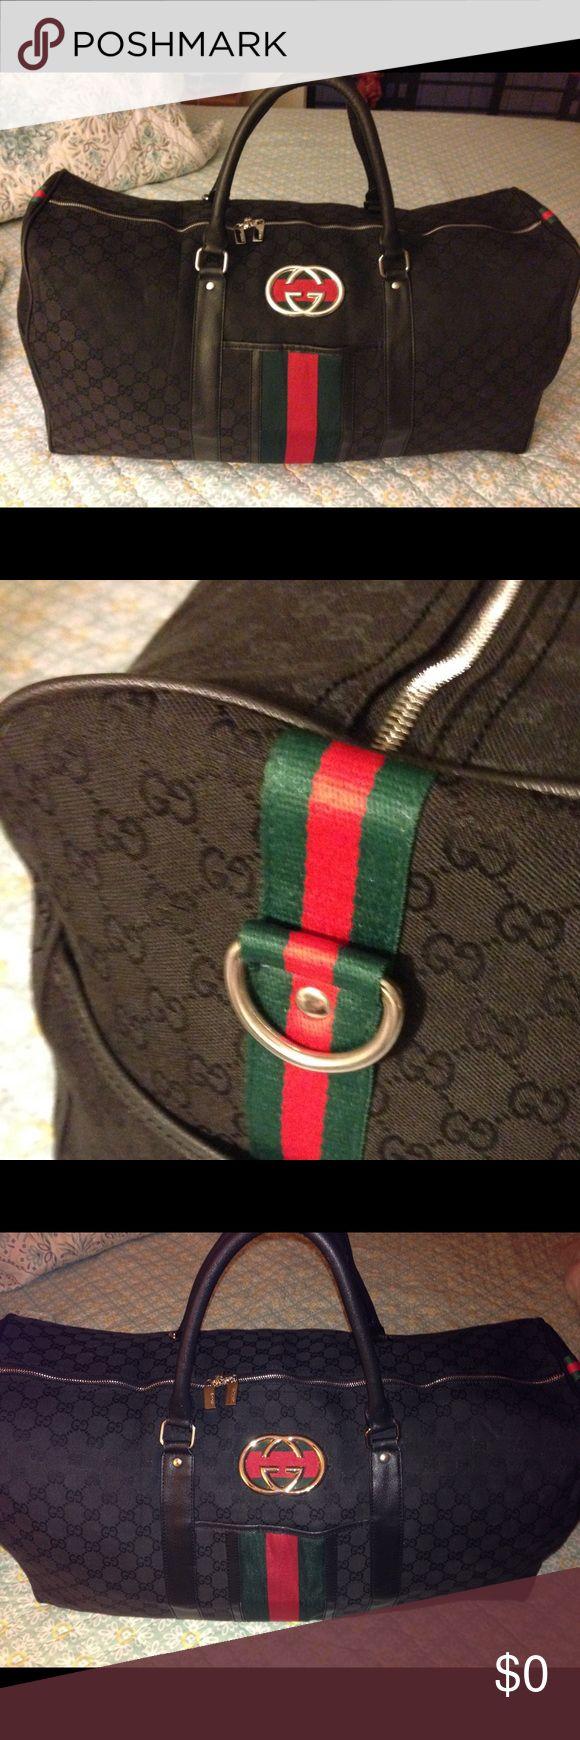 Additional Photos of Designer Inspired Travel Bag 🌸Additional Photos of Designer Inspired Gucci Travel Bag🌸 Bags Travel Bags